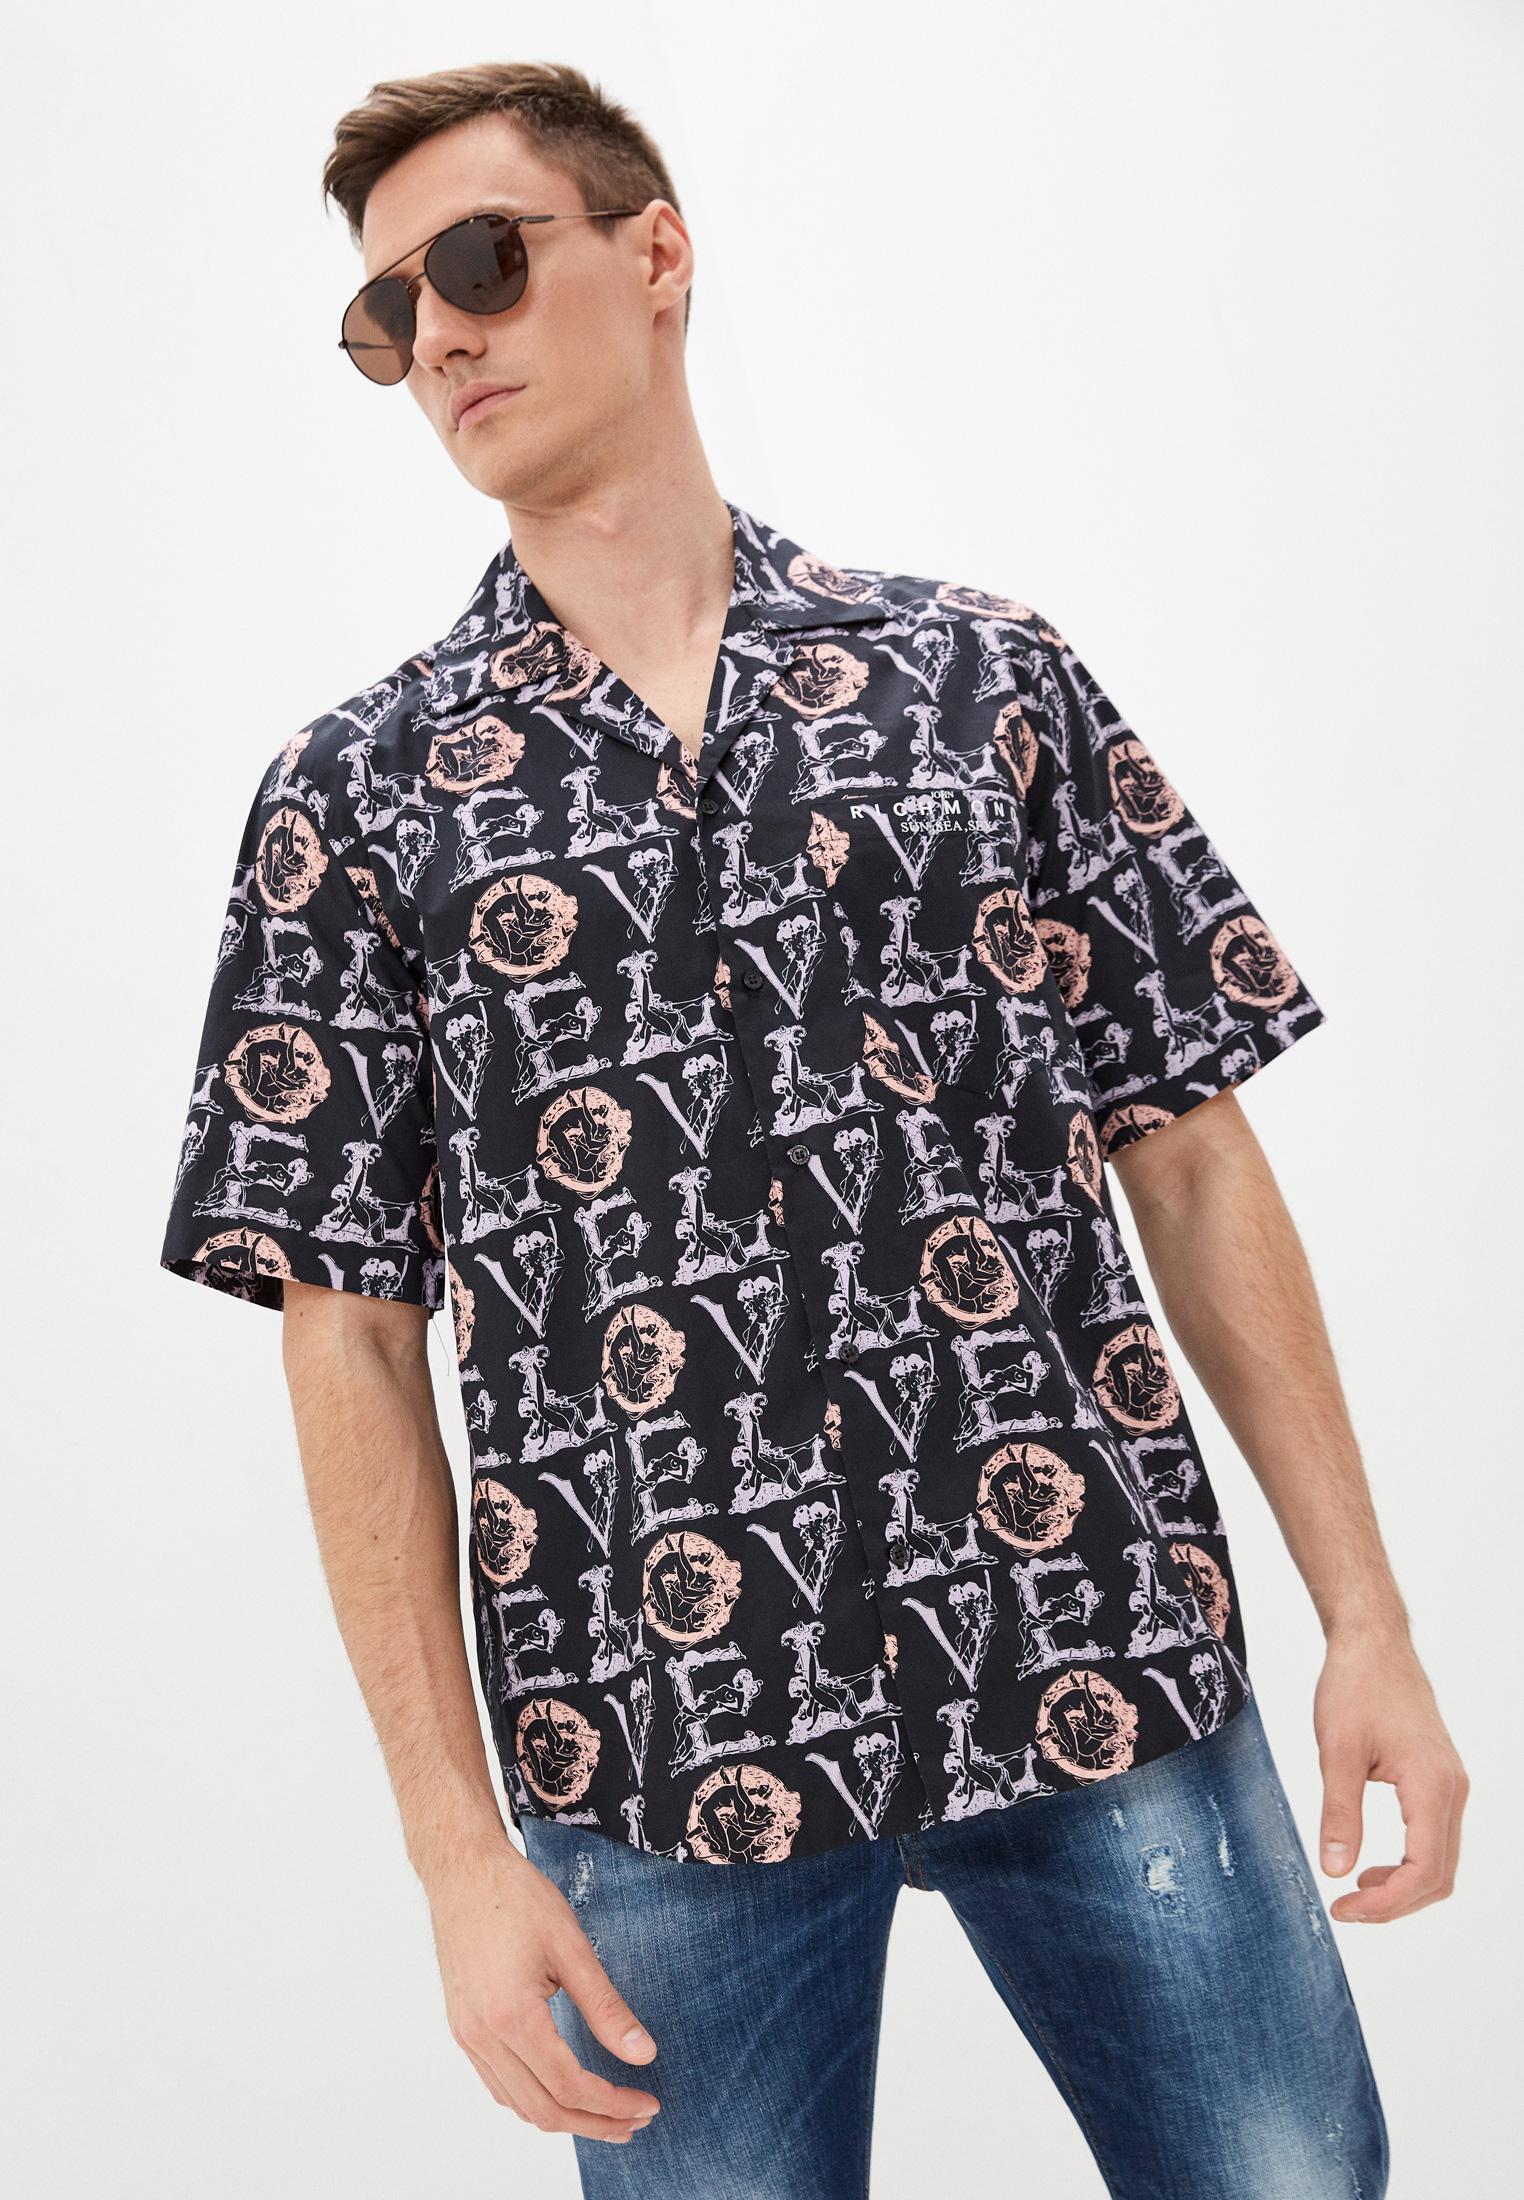 Рубашка с коротким рукавом John Richmond (Джон Ричмонд) Рубашка John Richmond